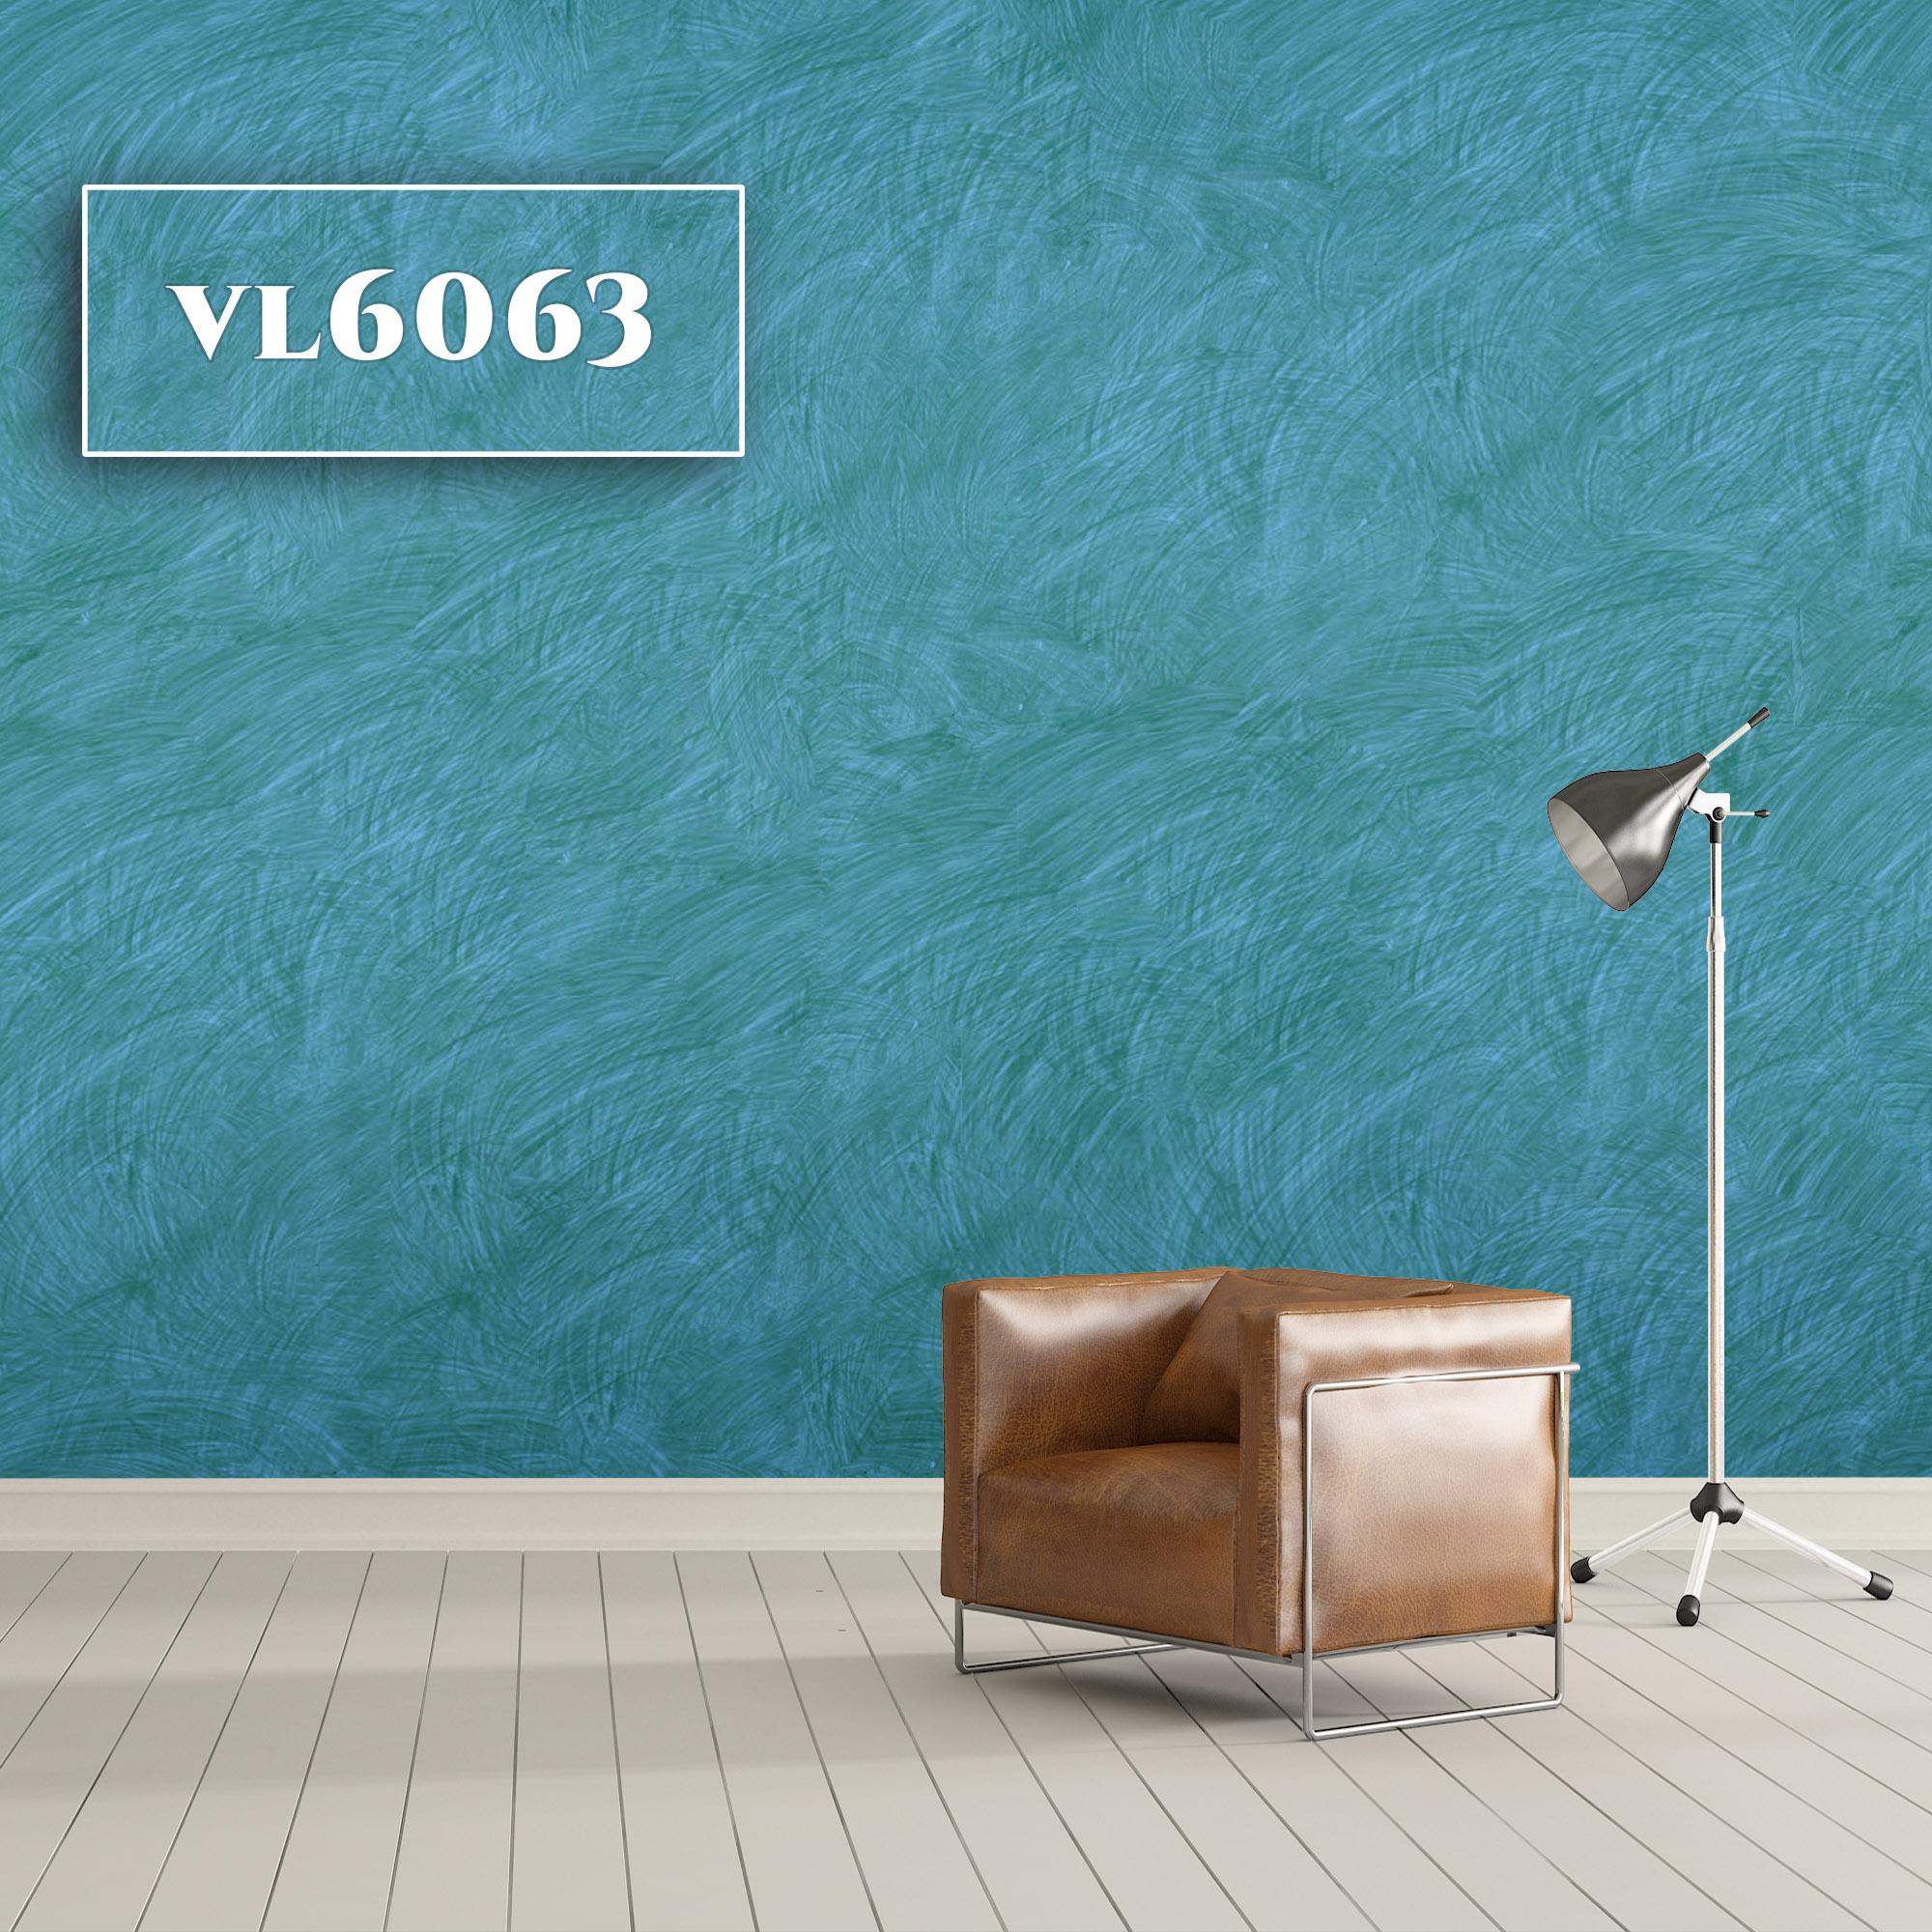 VL6063